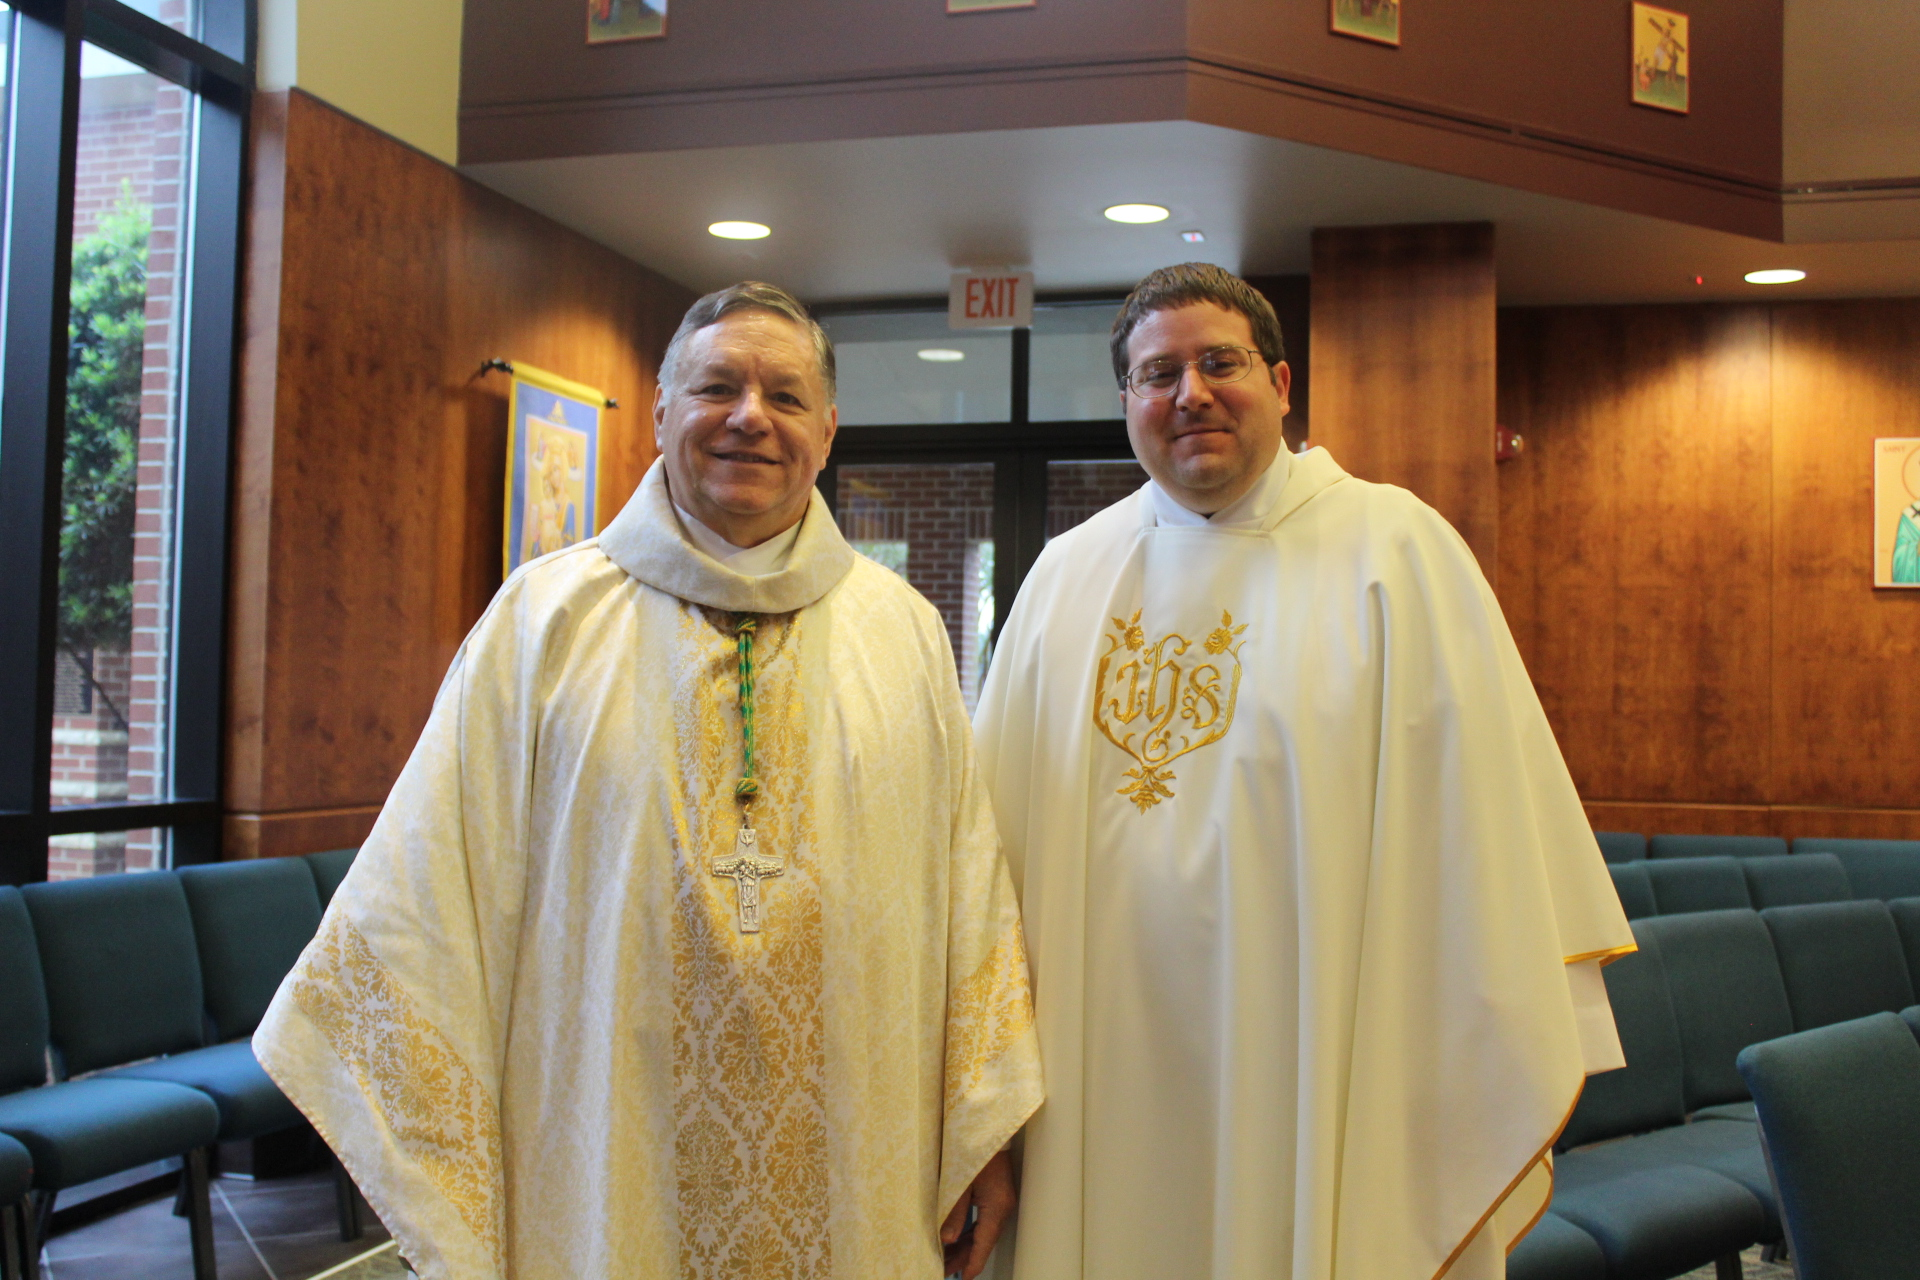 Most Reverend Bishop Kihneman celebrates Mass at St. Patrick Catholic High School